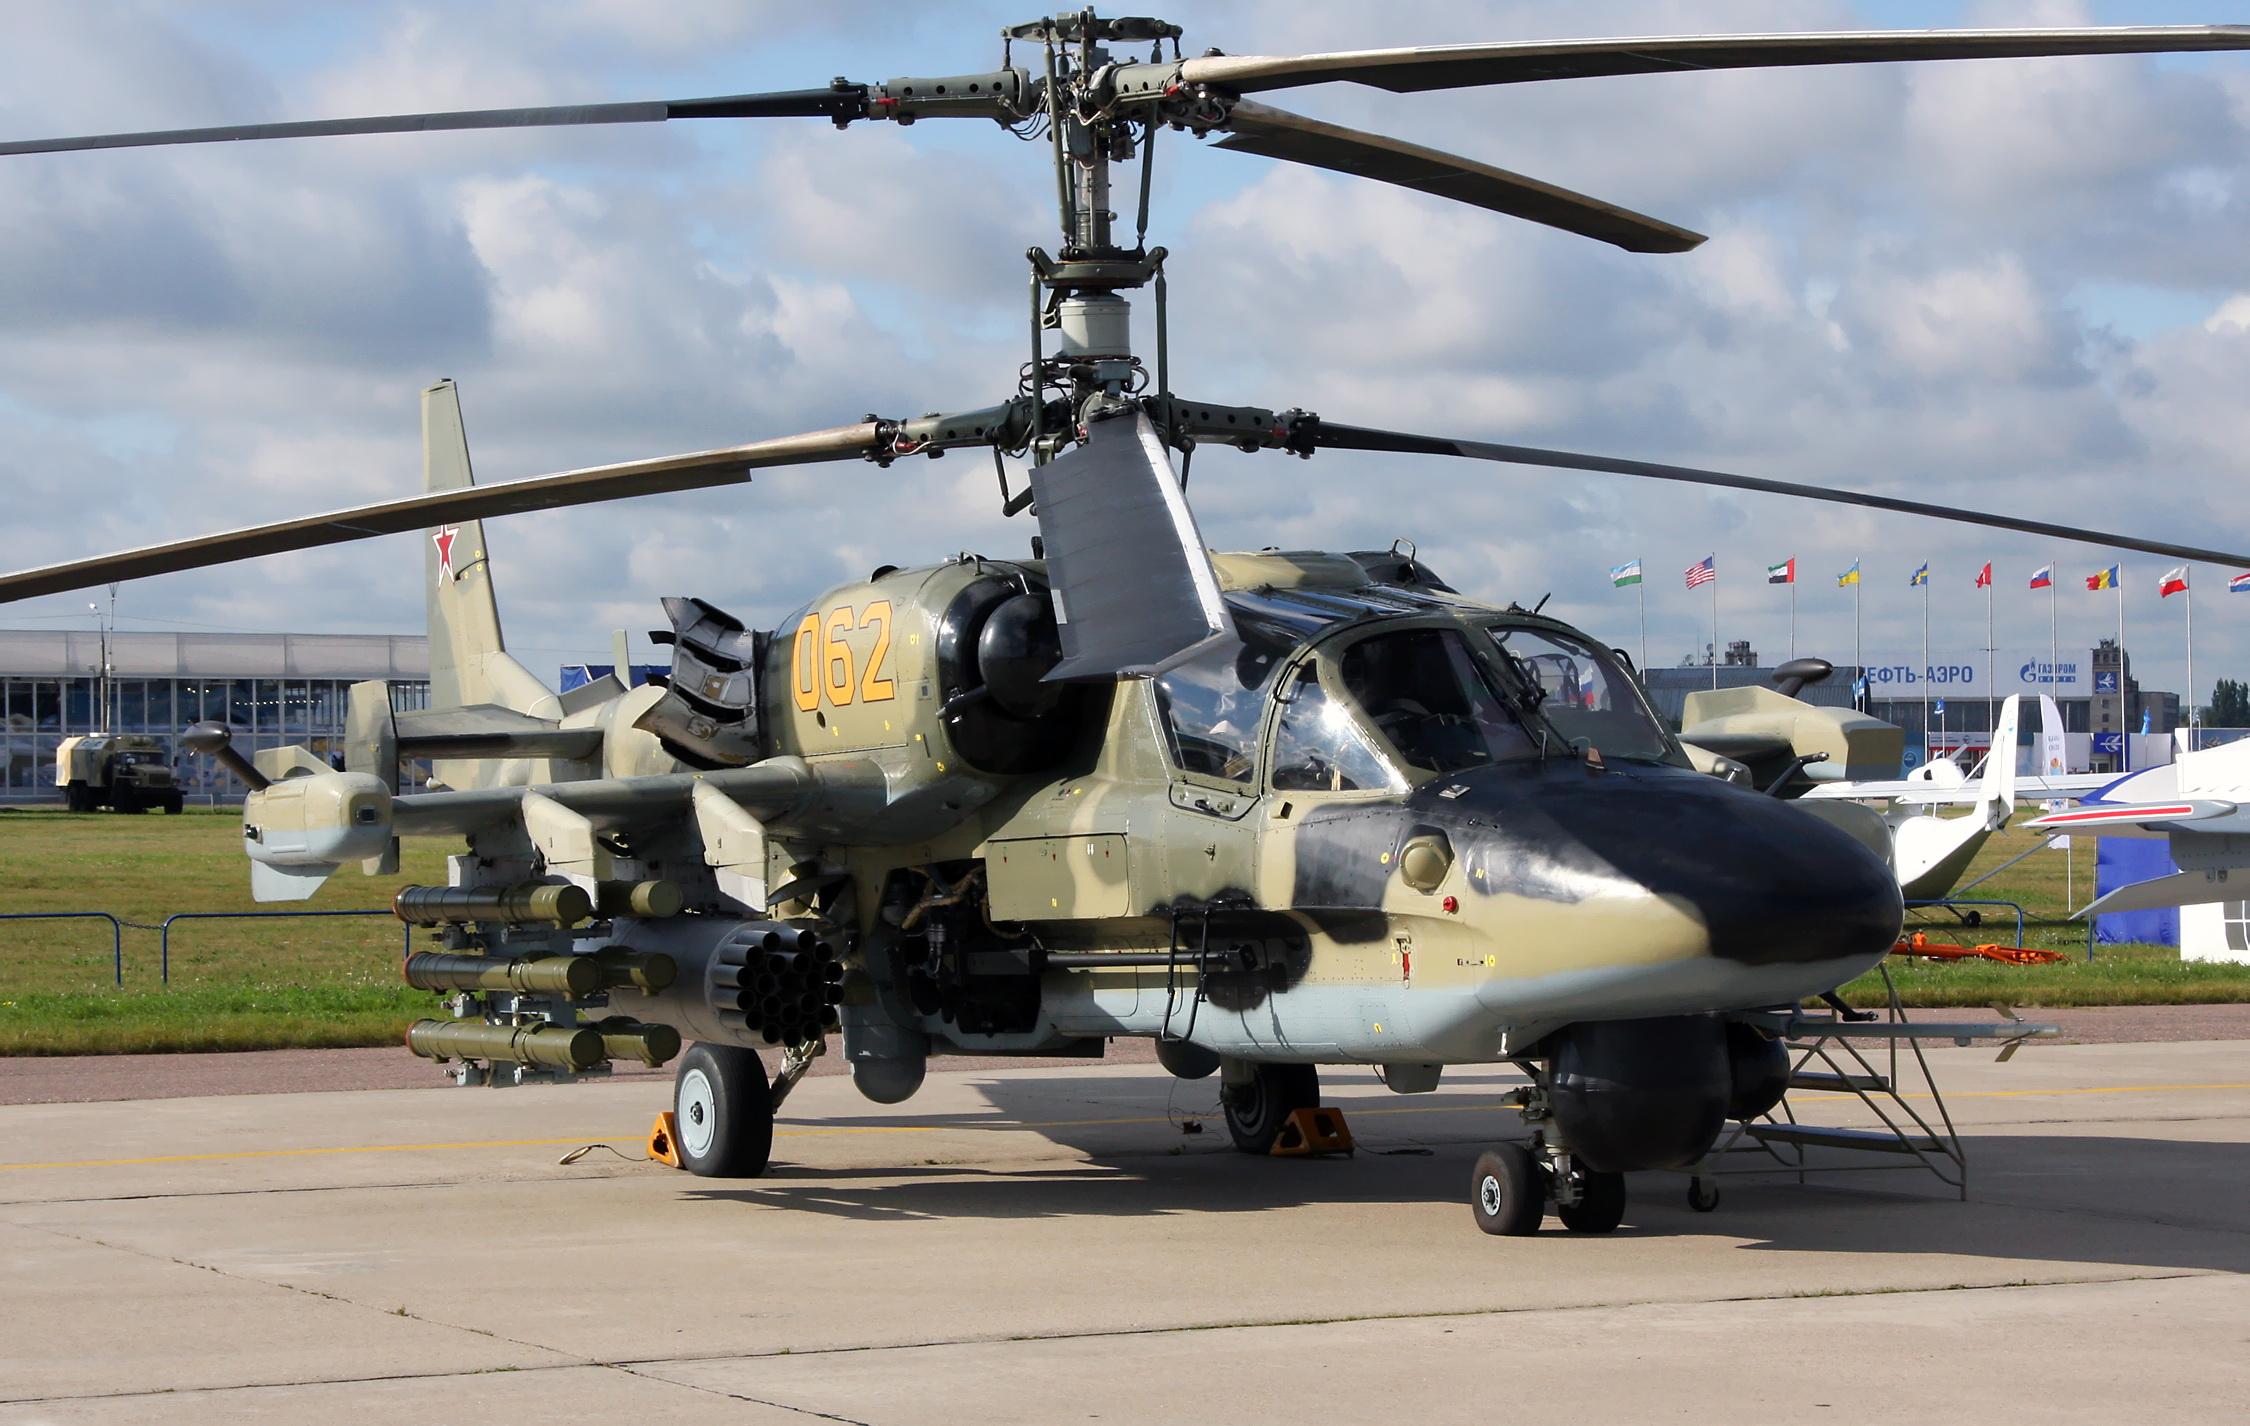 Elicottero Ka 52 : File ka attack helicopter g